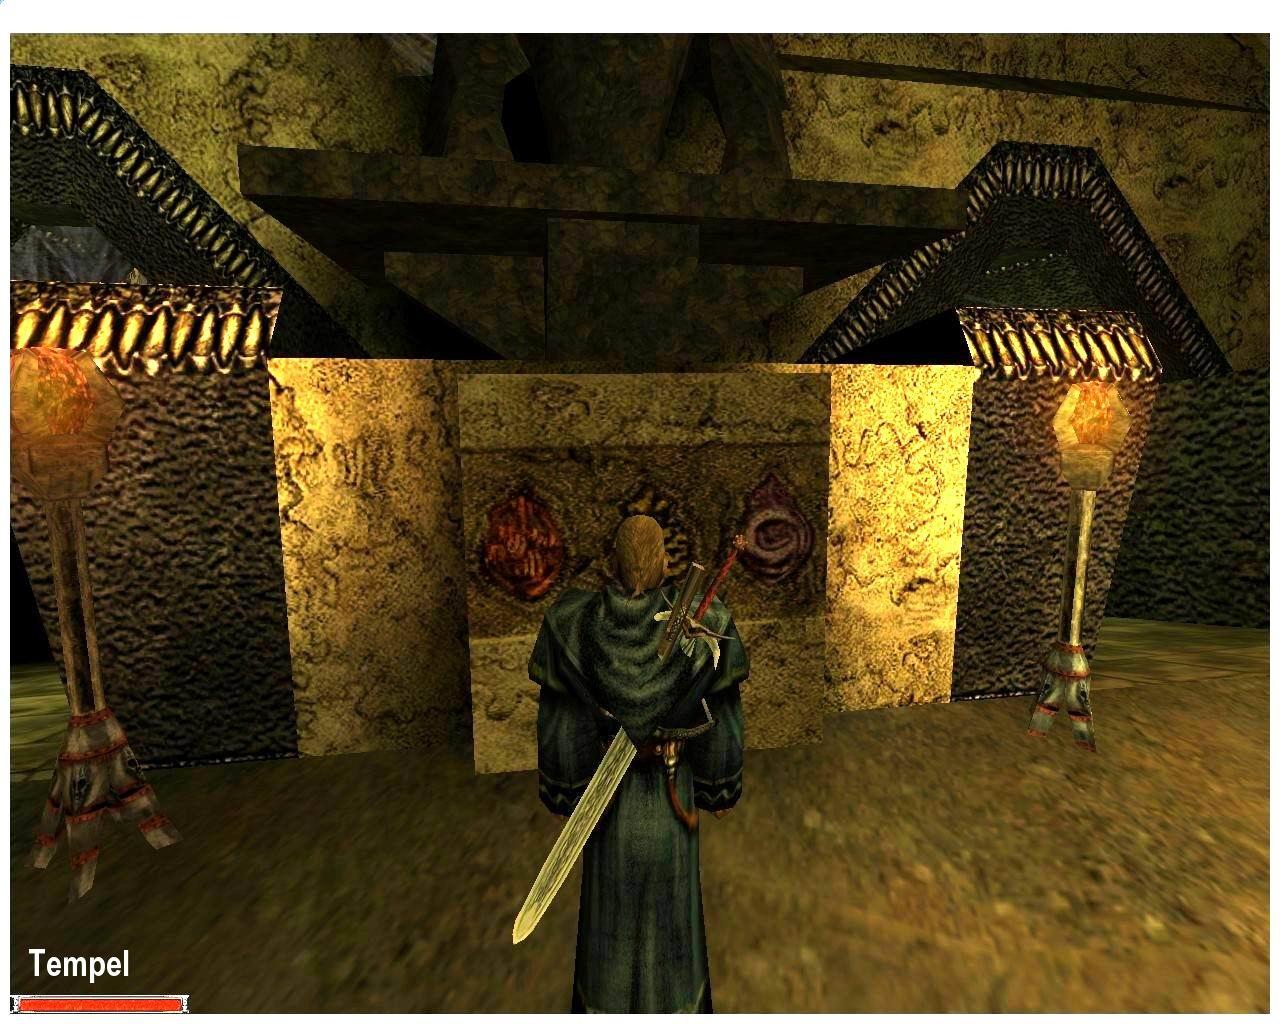 45 Gothic - Orc-Stadt 3 Orc-Tempel Symbole.jpg